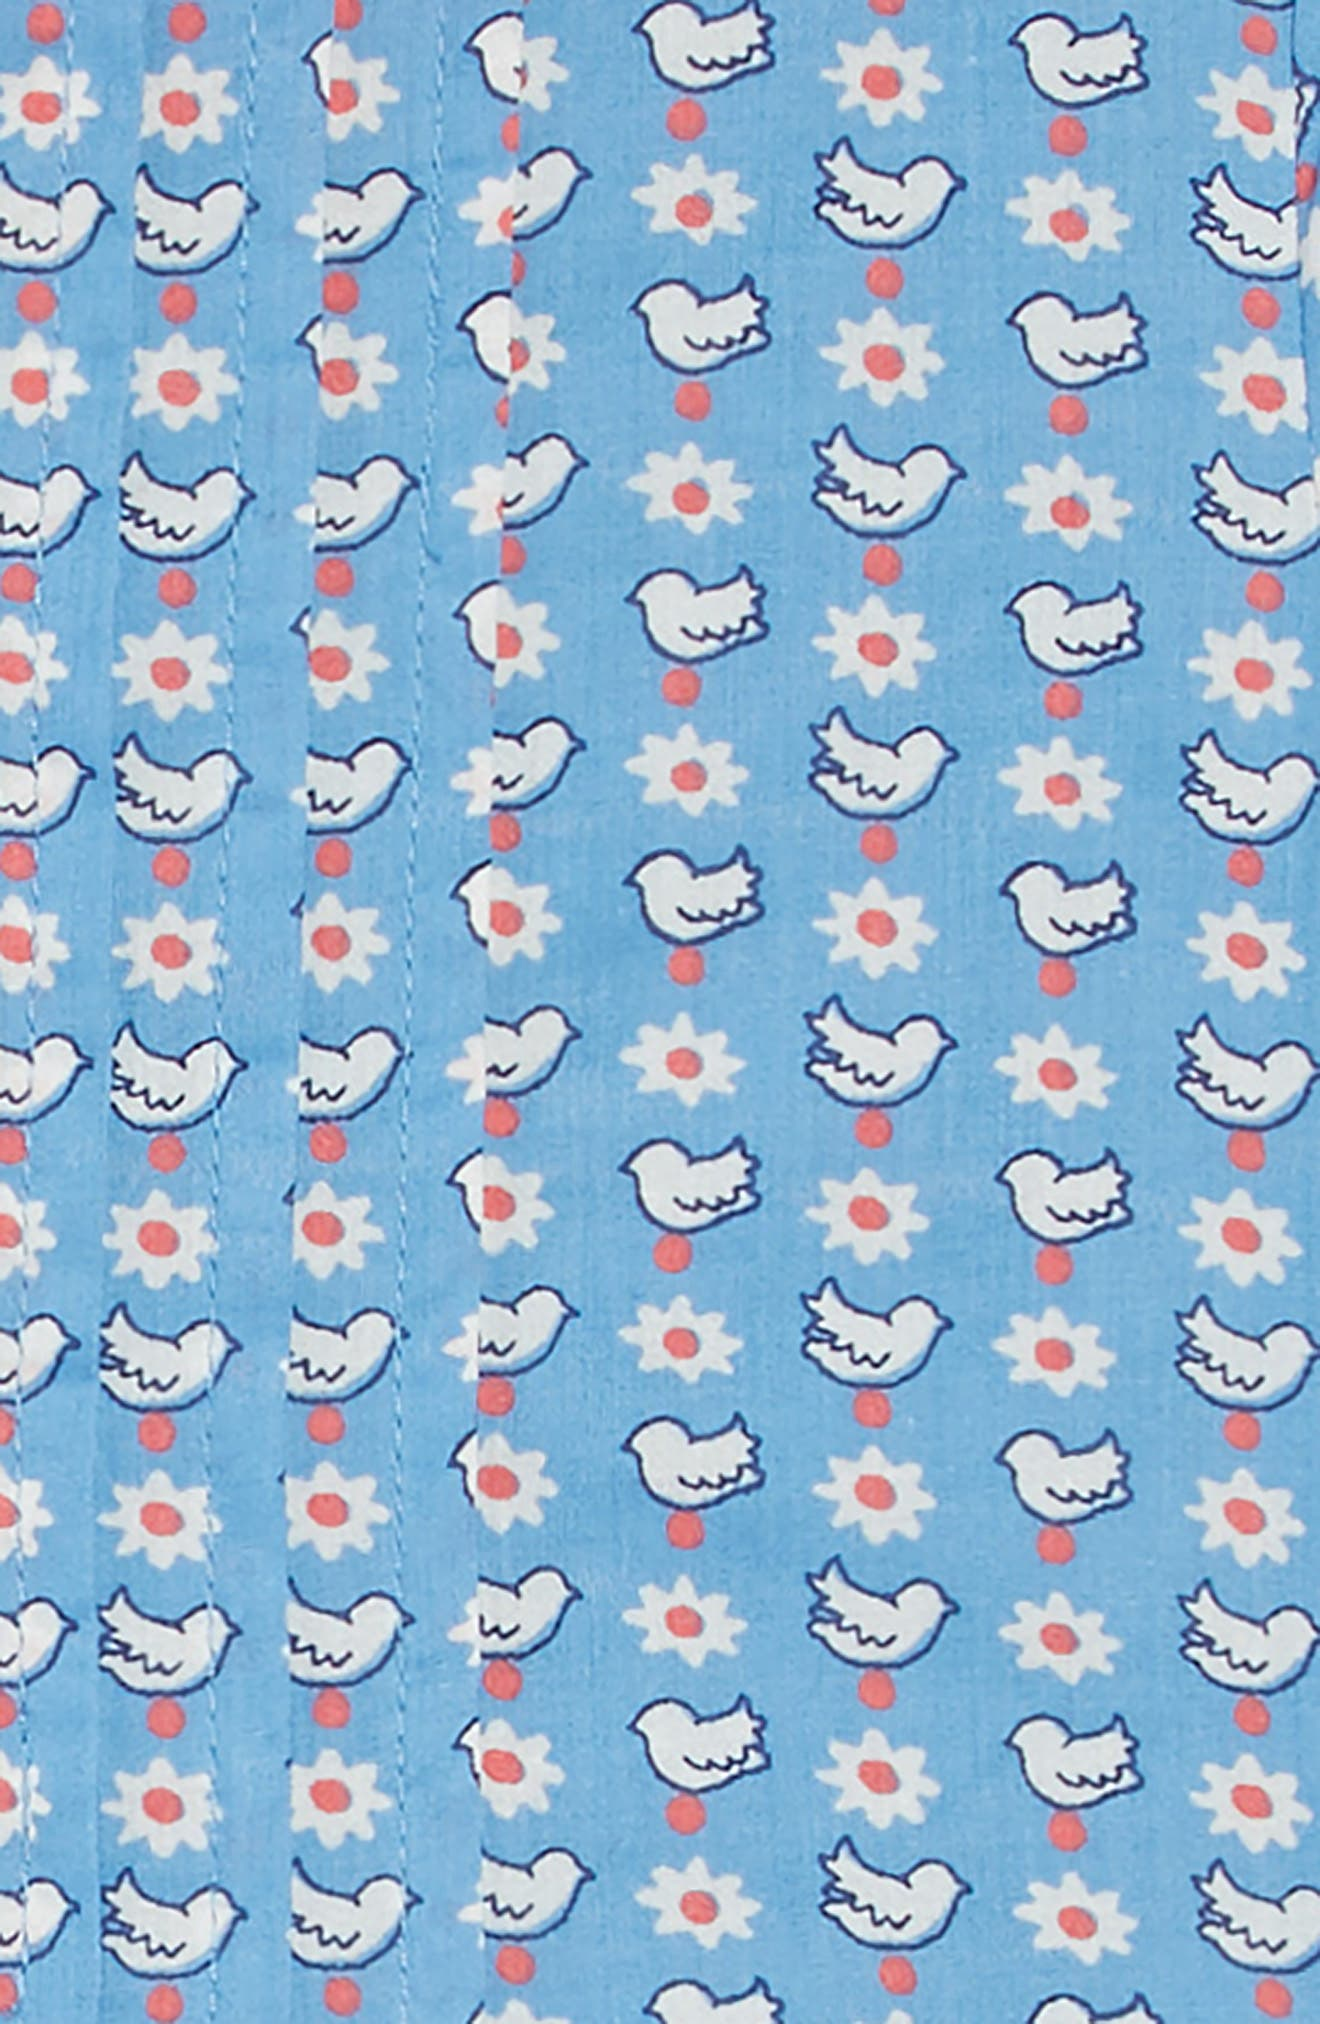 Nostalgic Collared Dress,                             Alternate thumbnail 3, color,                             BLUE GEO BIRDS